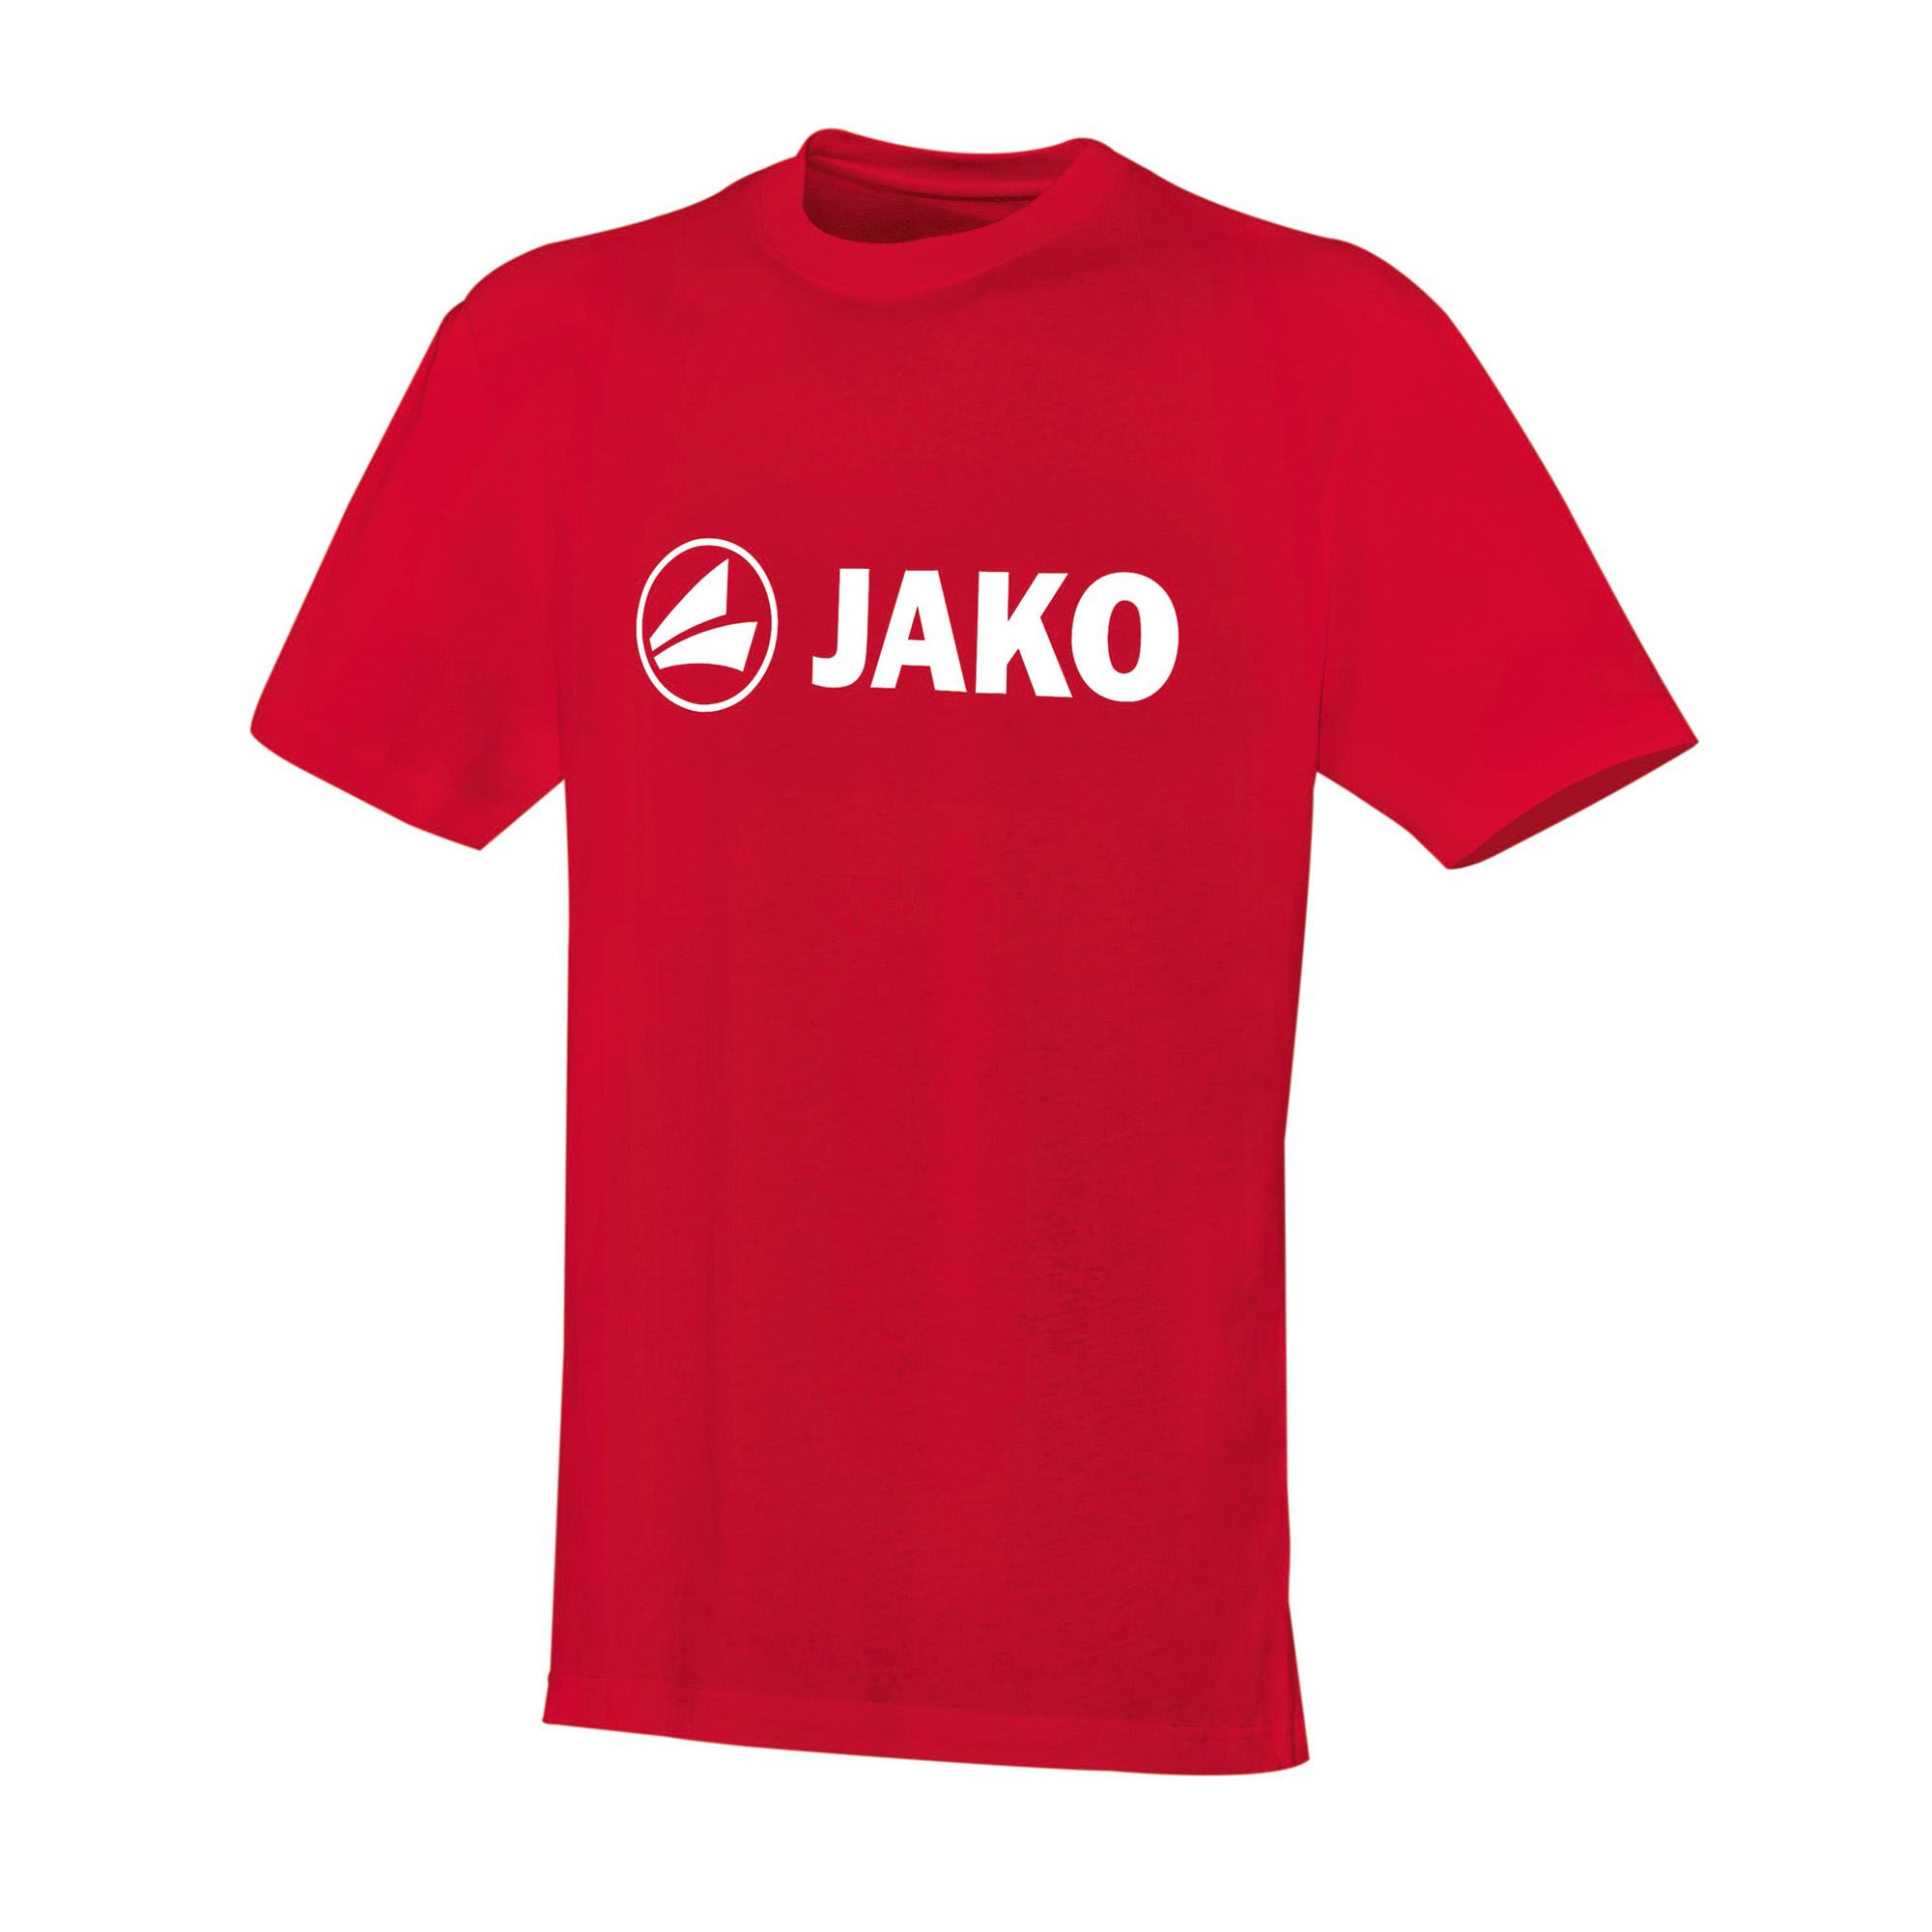 Jako Kinder T-Shirt Promo 6163-01 128